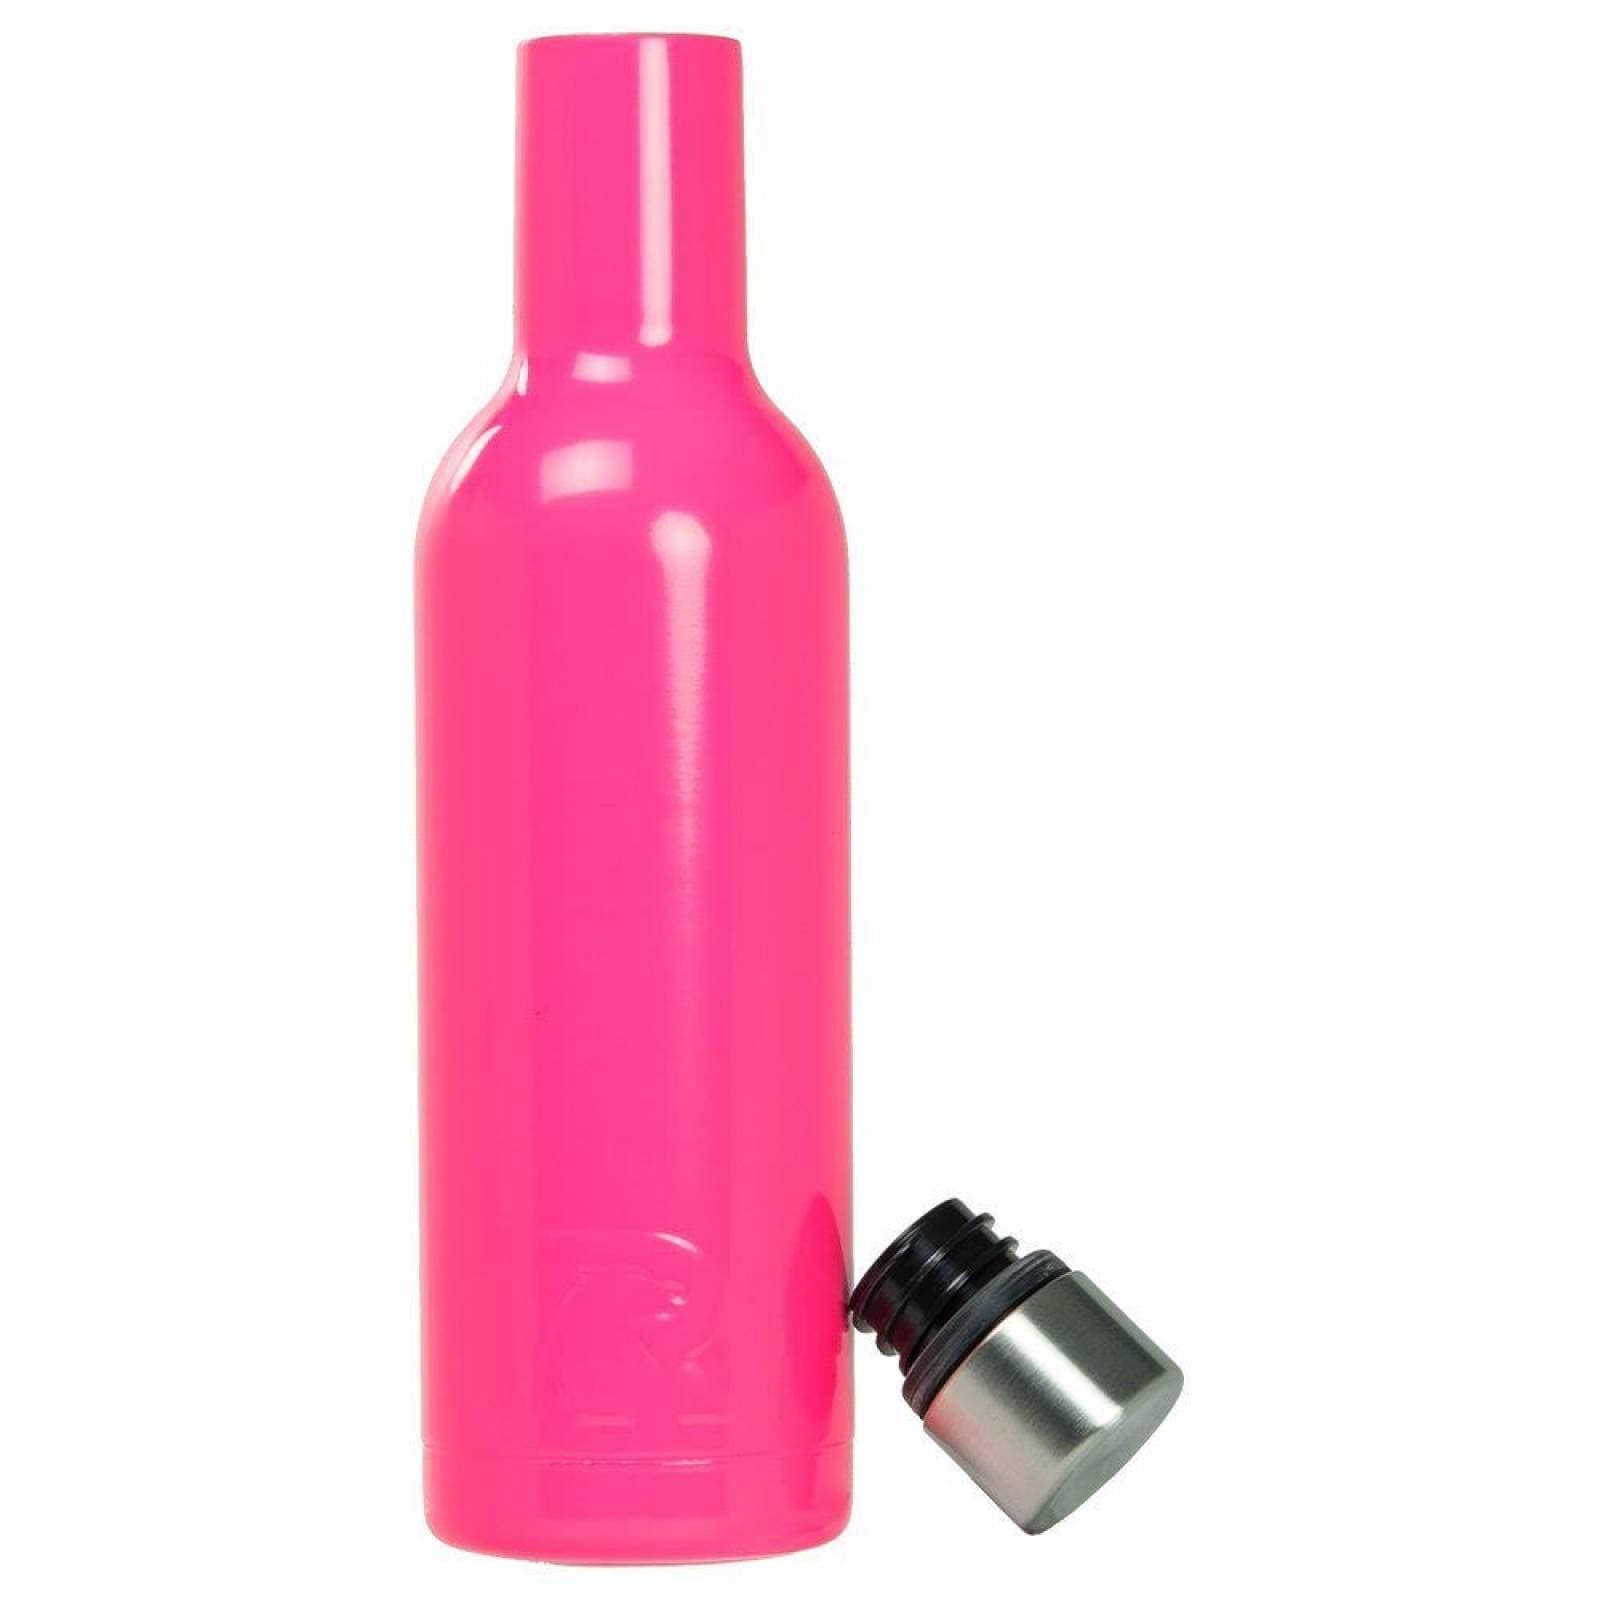 RTIC Wine 375 ml. Pink   852